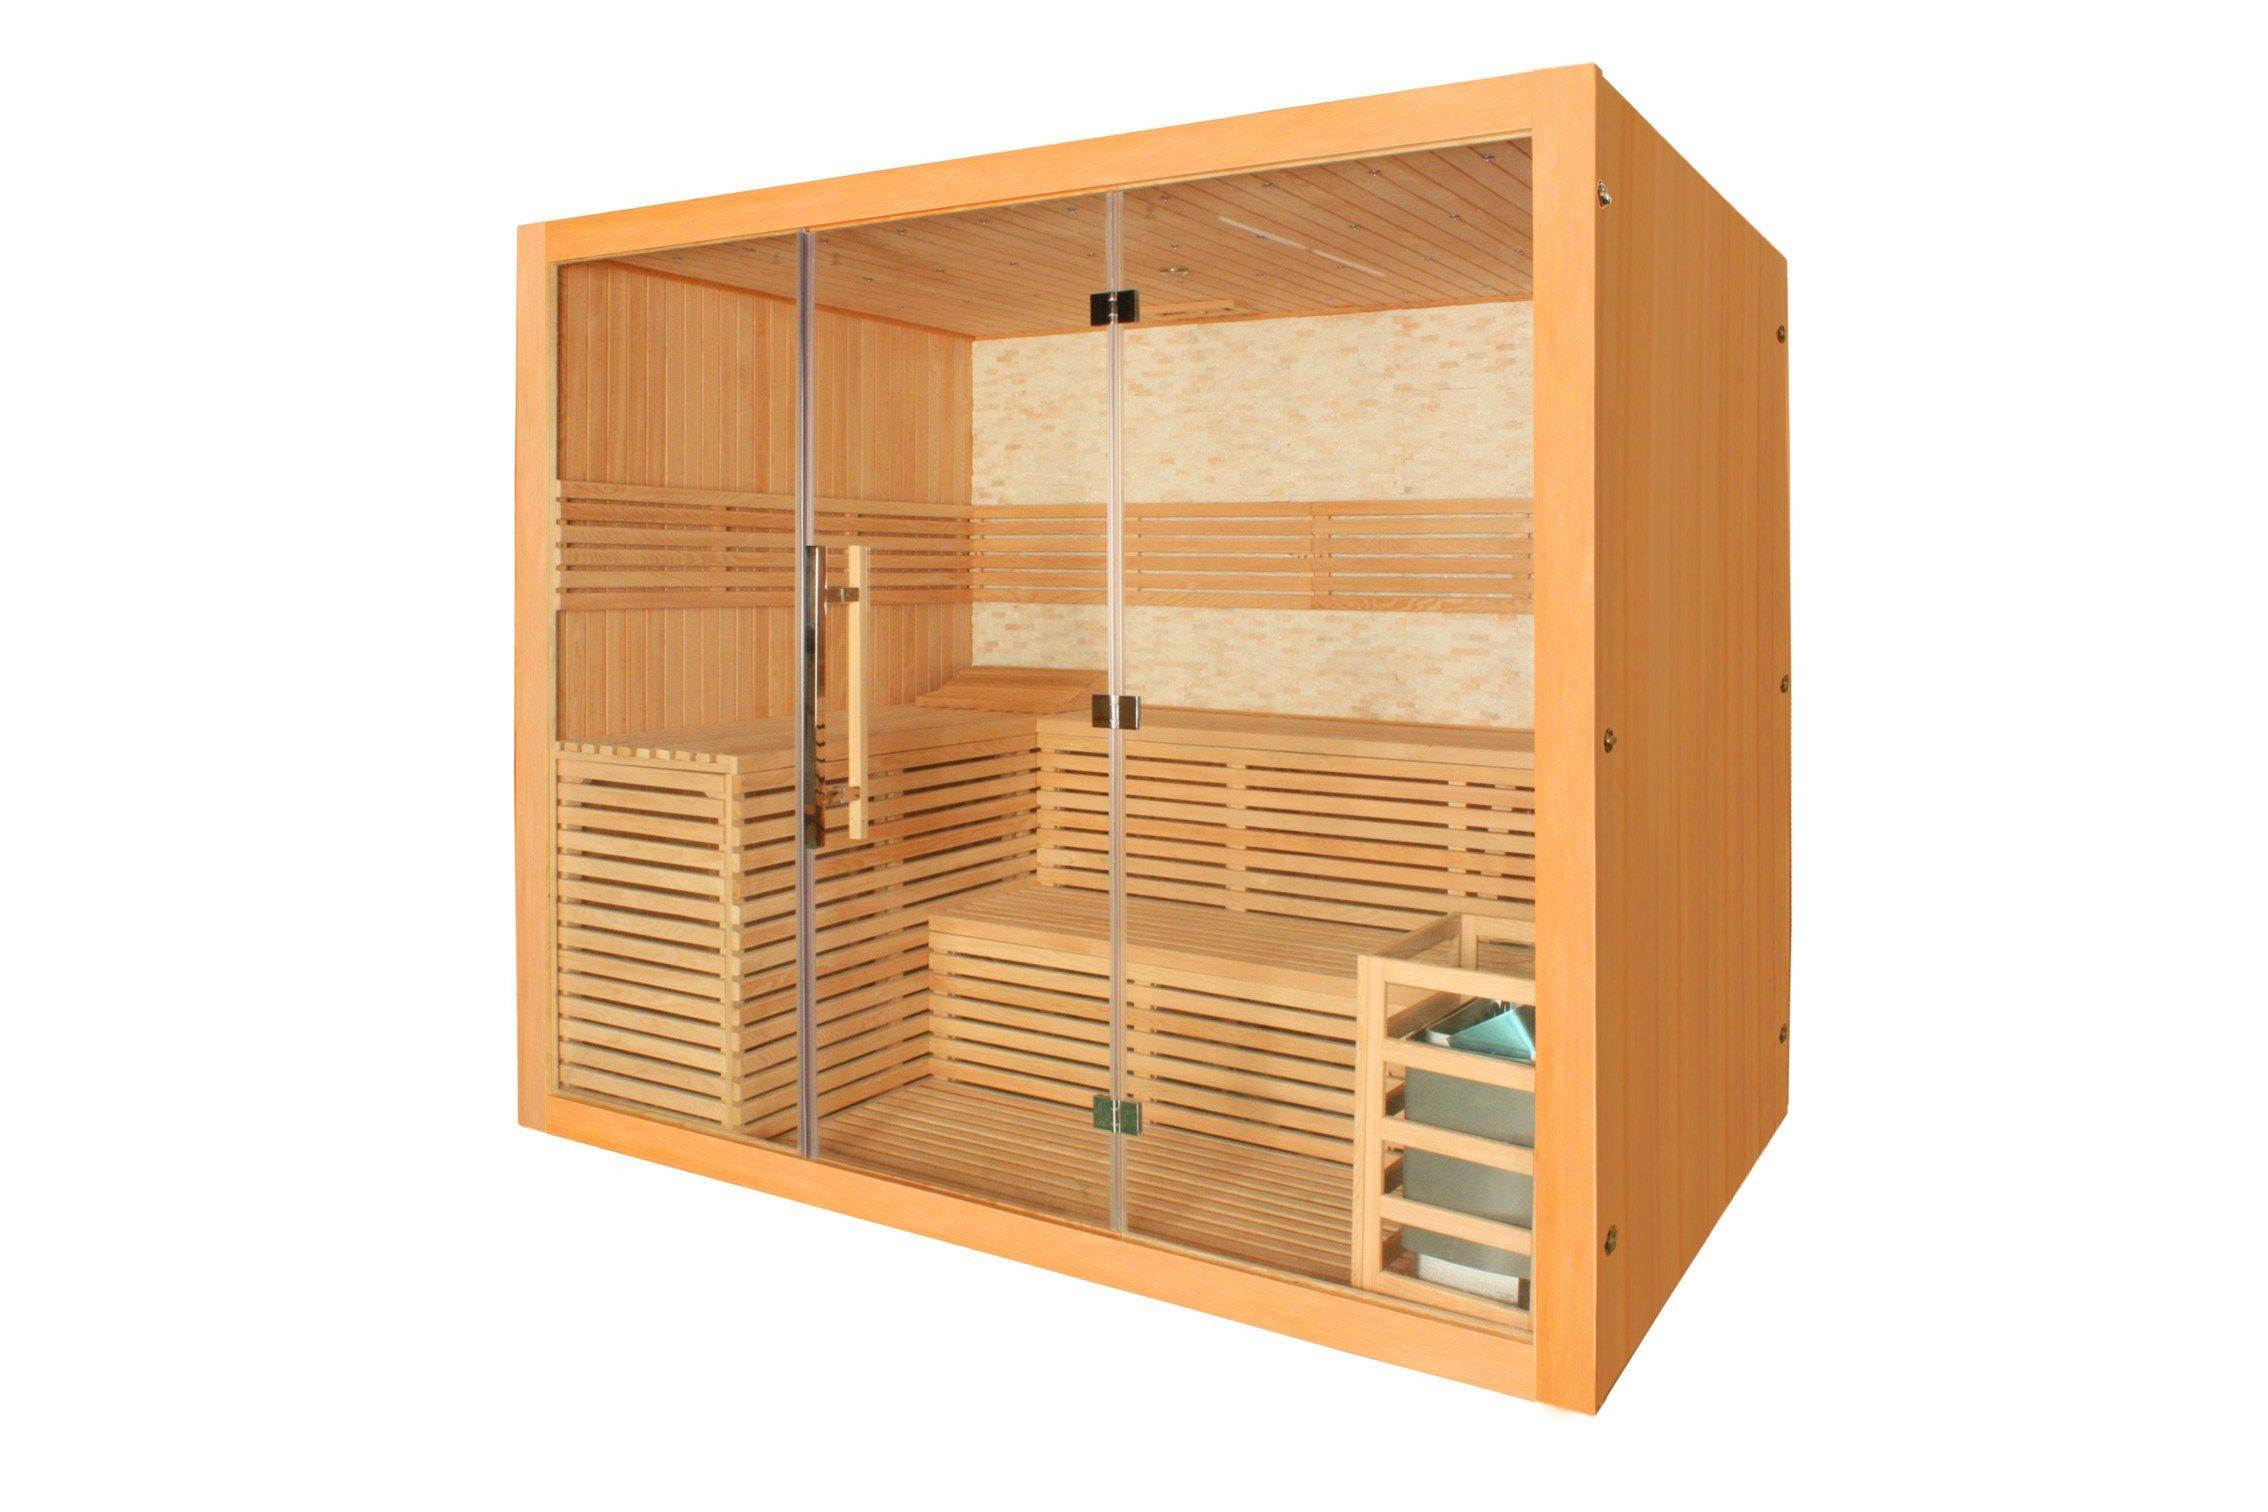 BL-152 Sauna finlandese by Beauty Luxury